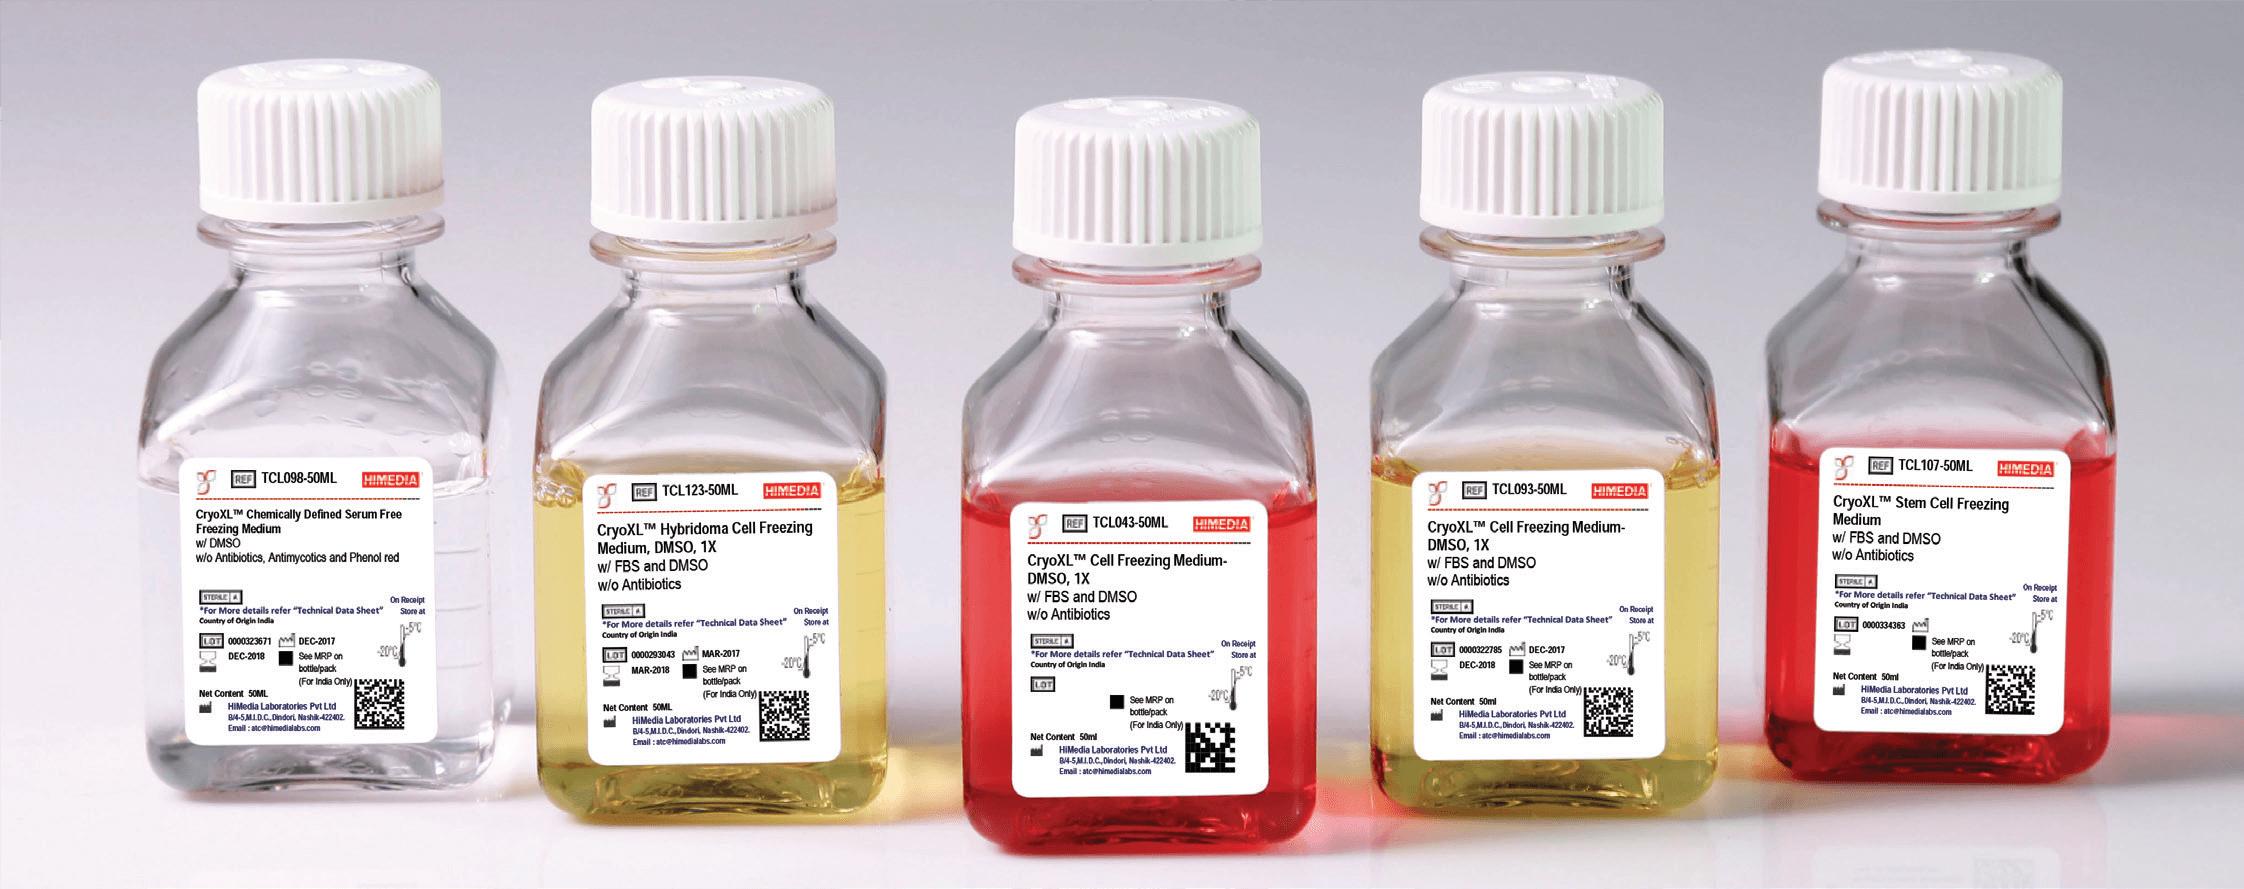 Cryopreservation Bottles